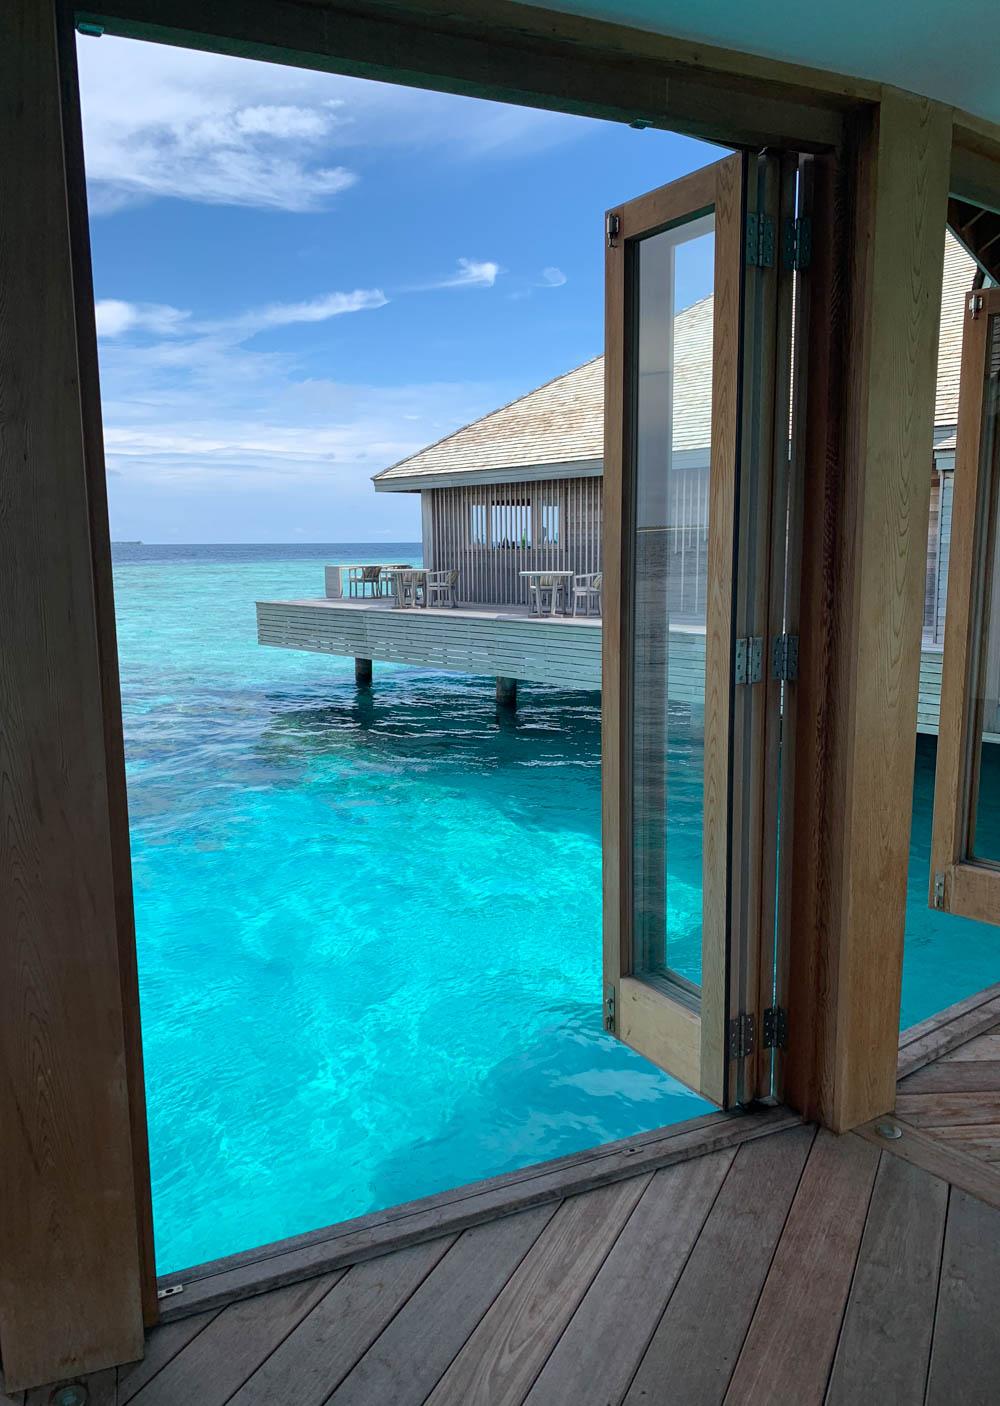 Maldives_Resort_Honeymoon_Hurawalhi_MaldivesTravelAdvisor-32.jpg